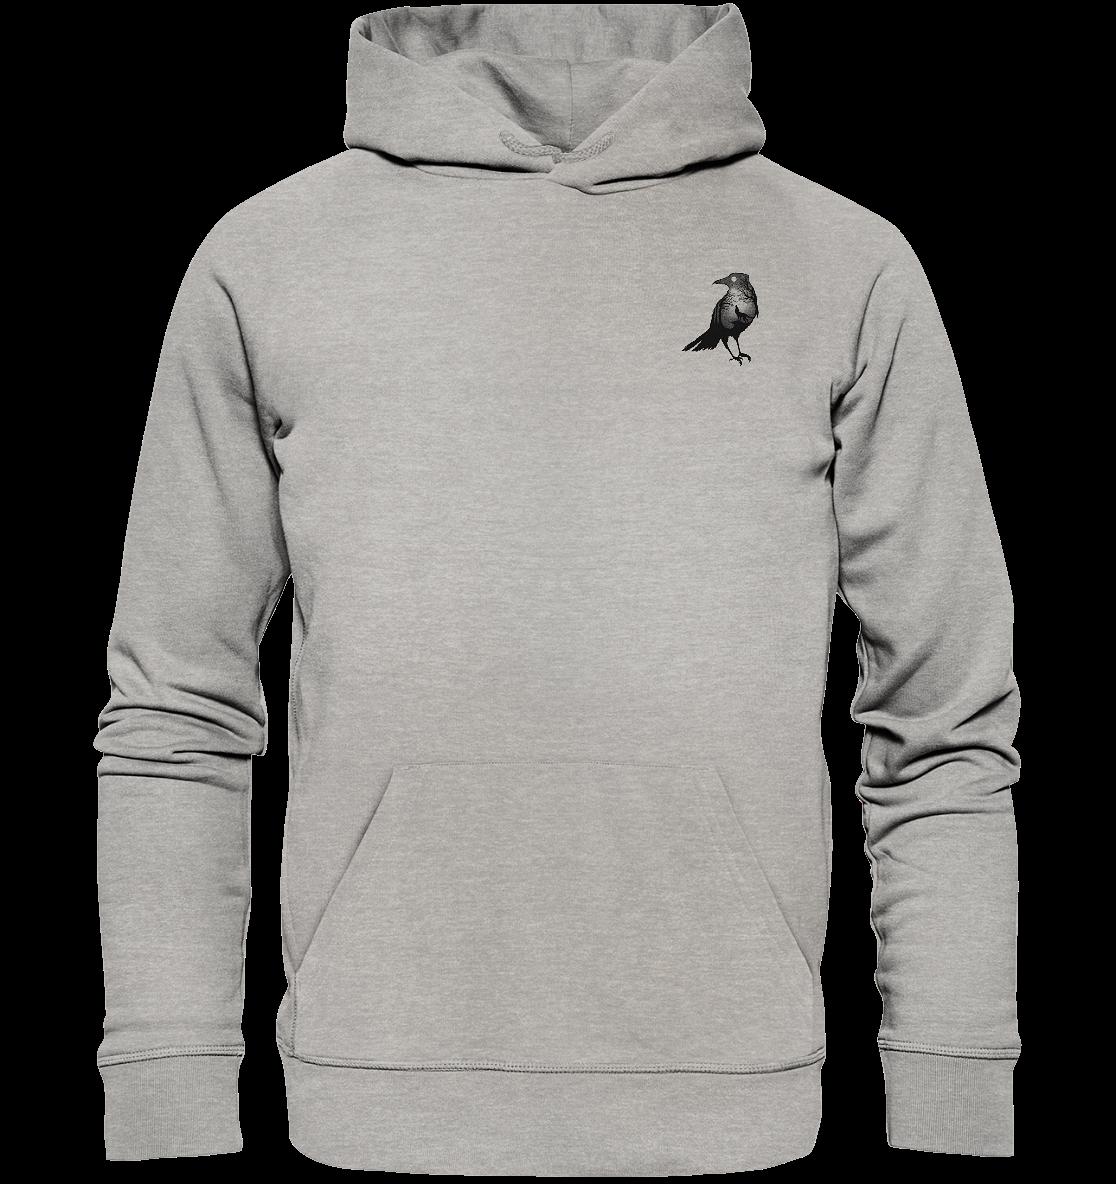 front-organic-hoodie-c2c1c0-1116x-2.png